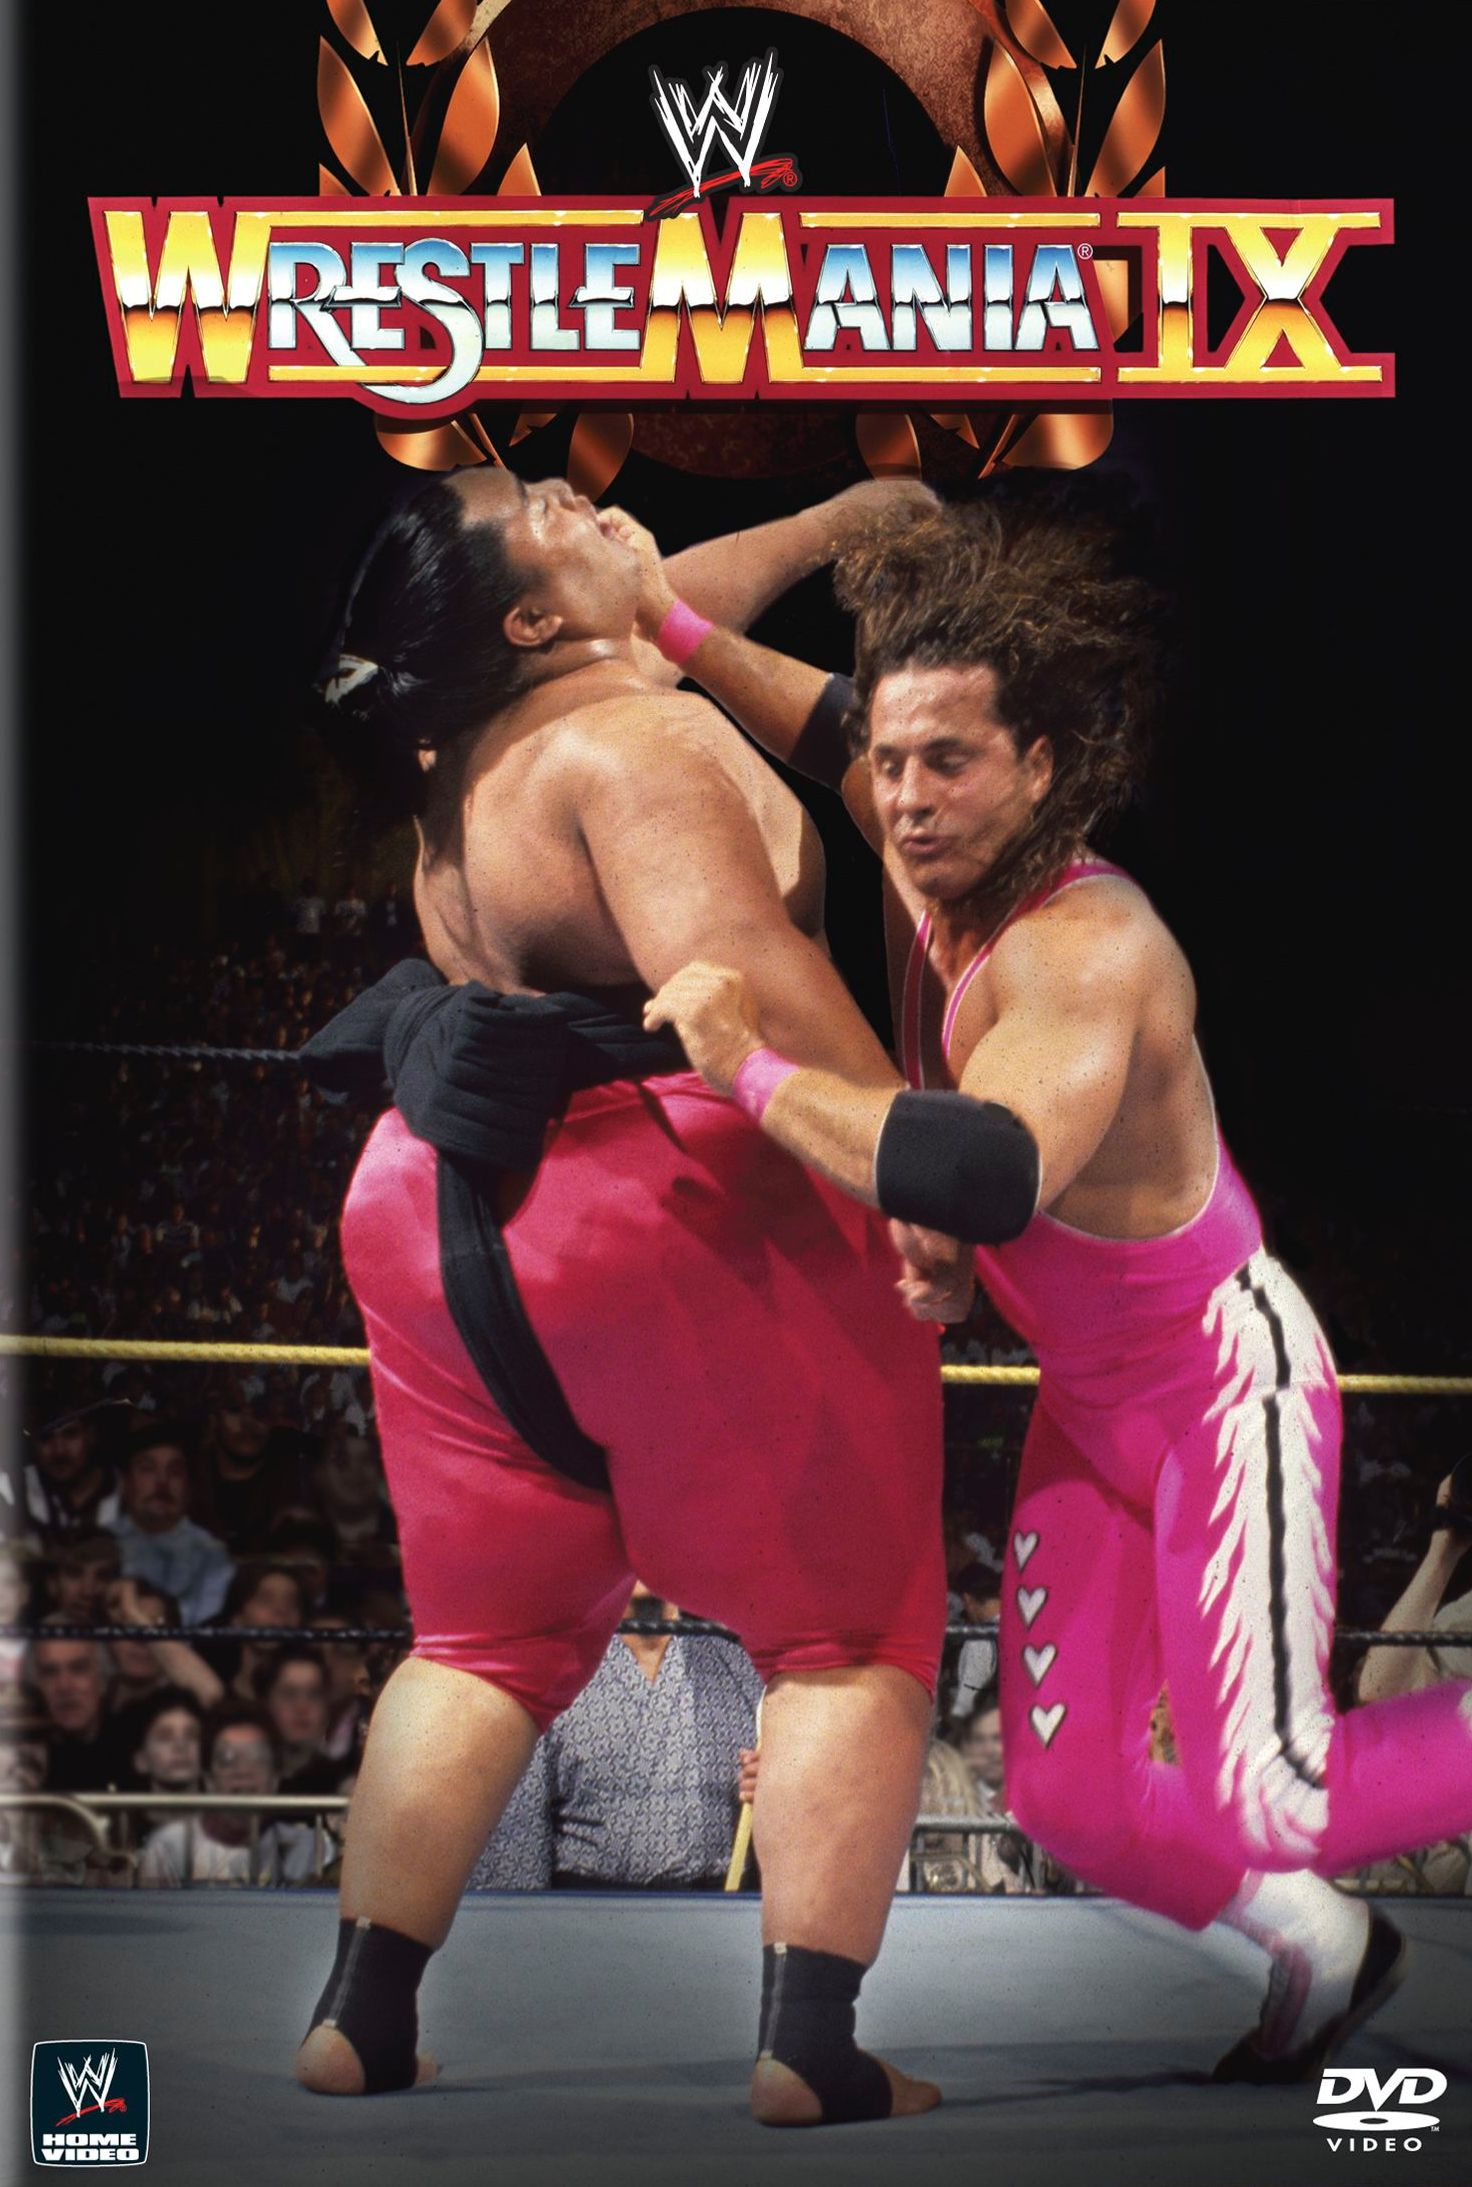 WWE: Wrestlemania IX